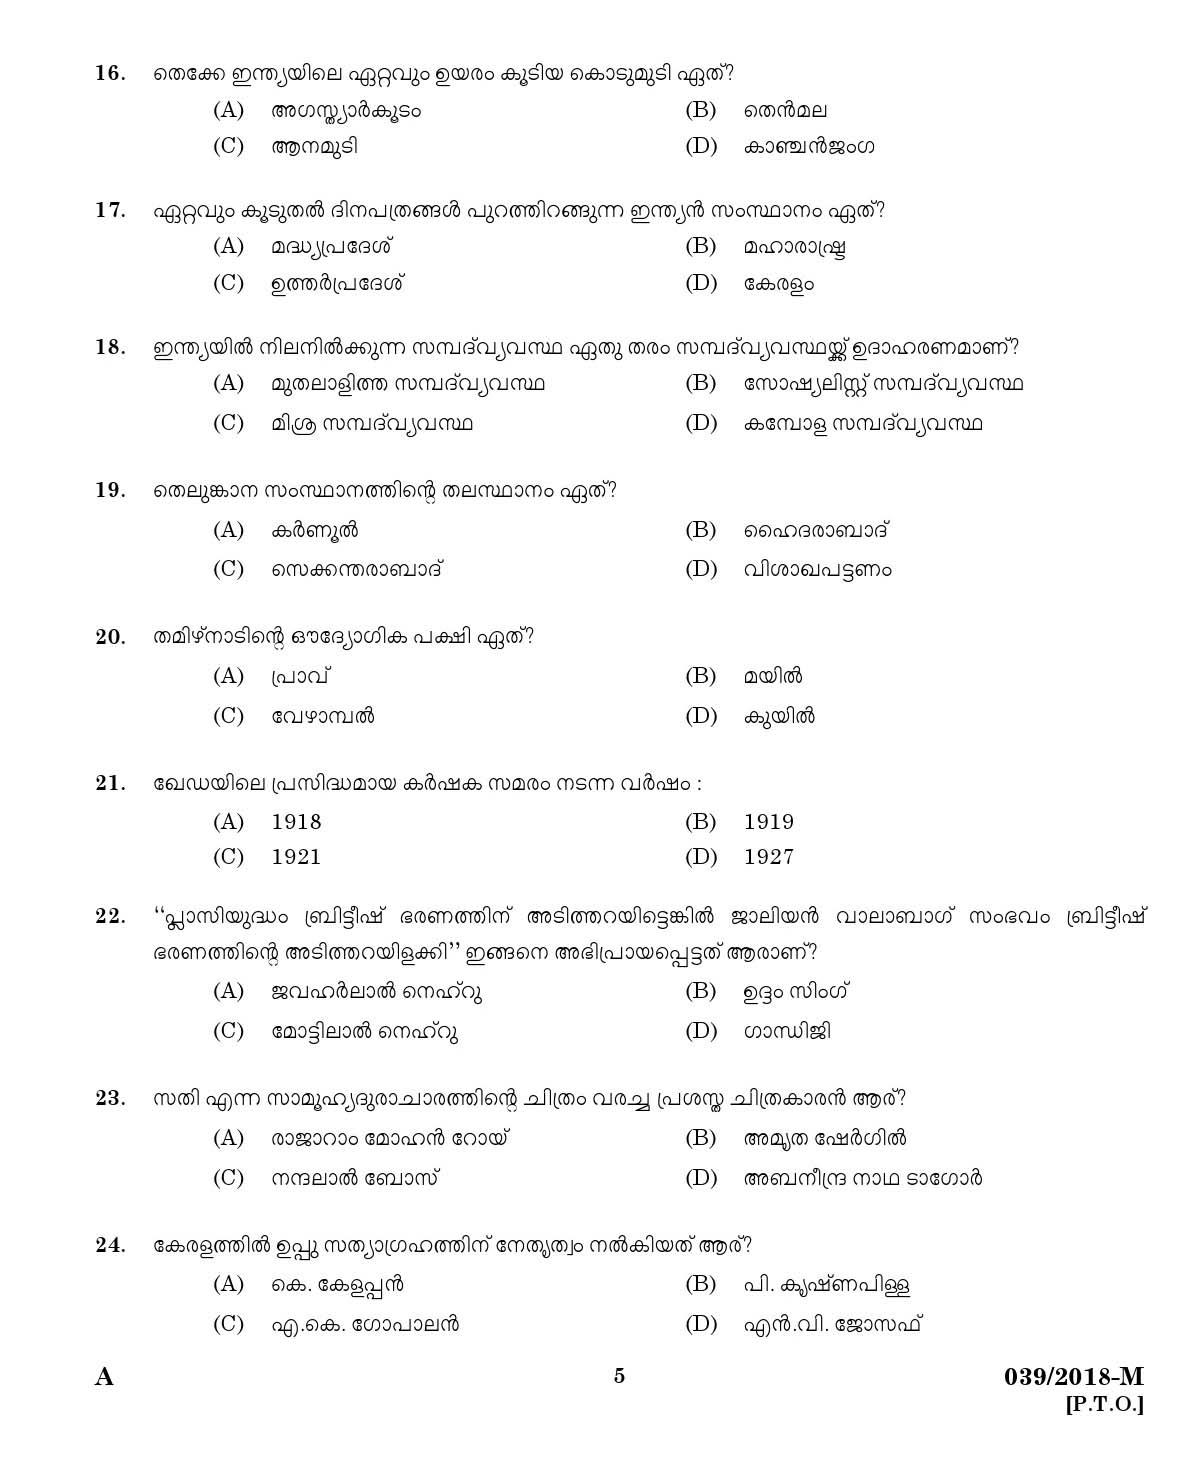 Kerala PSC Security Guard Exam 2018 Question Paper Code 0392018 M